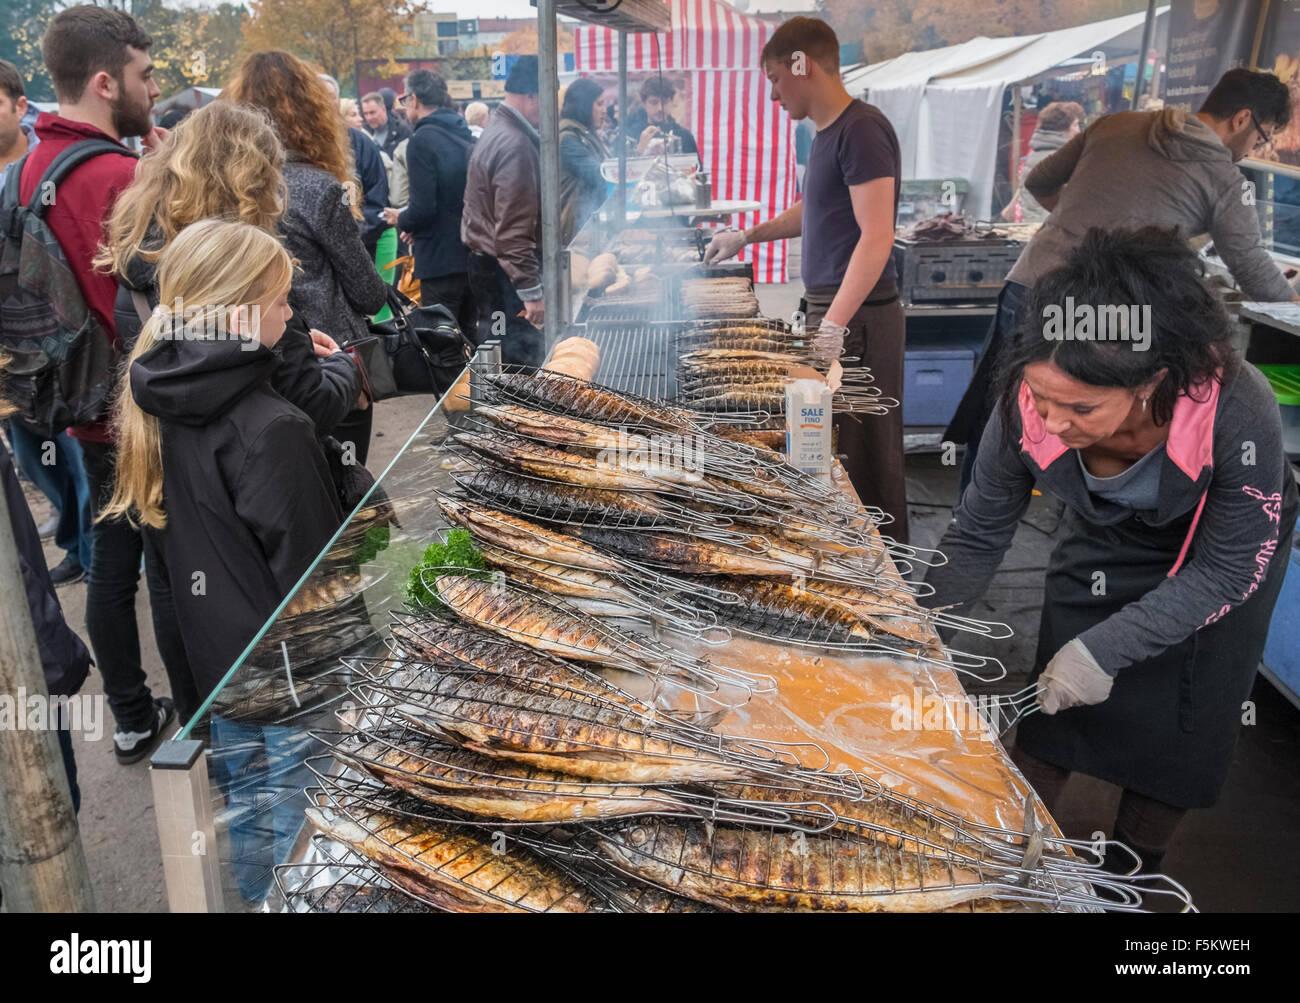 Fresh cooked fish food stall, Mauerpark Sunday fleamarket, Prenzlauer Berg, Berlin, Germany Stock Photo